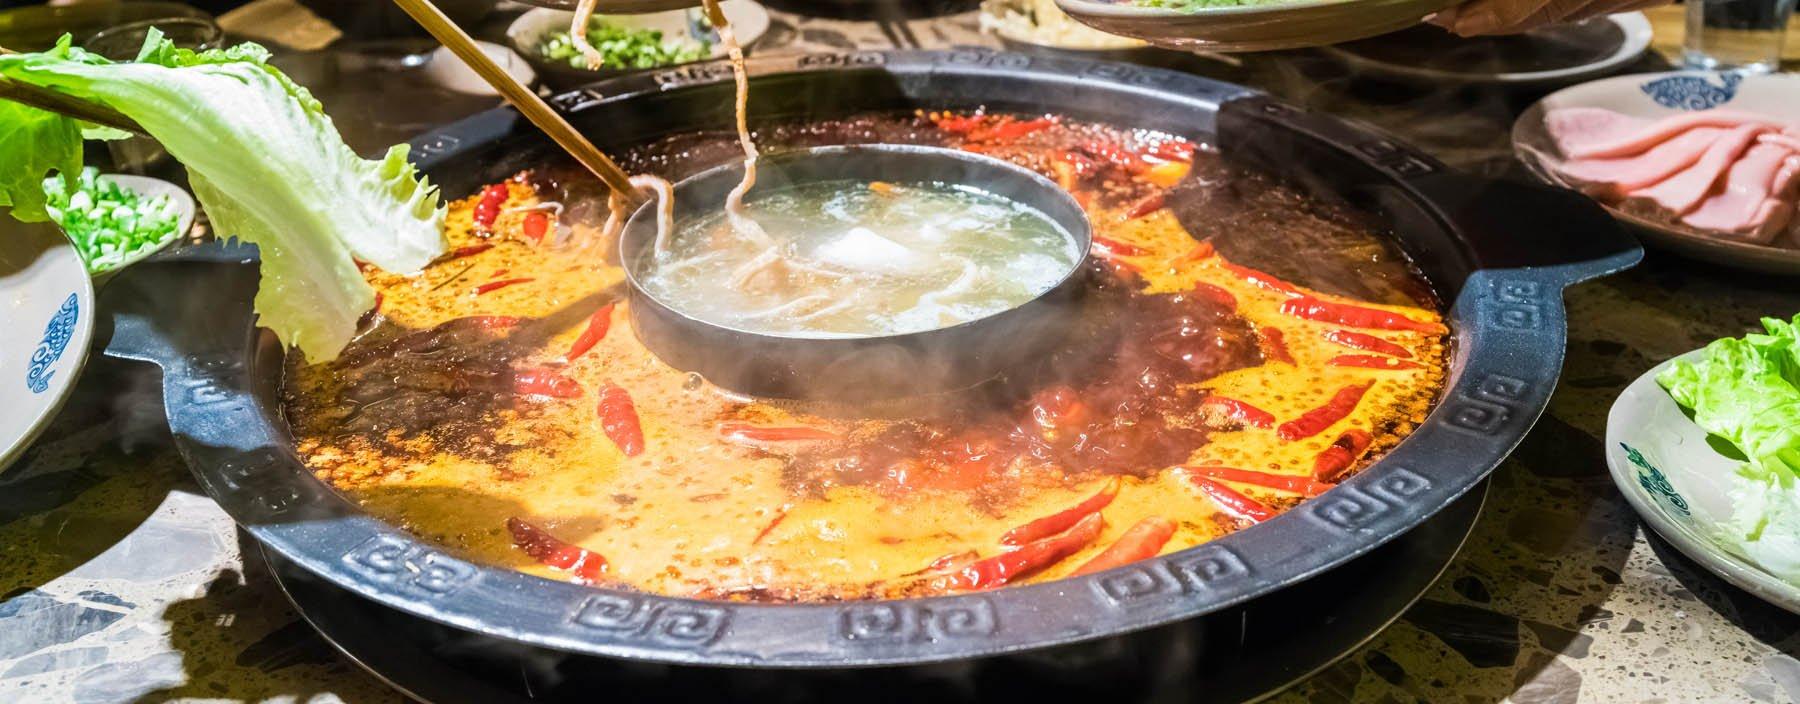 cn, chengdu, hot pot (2).jpg